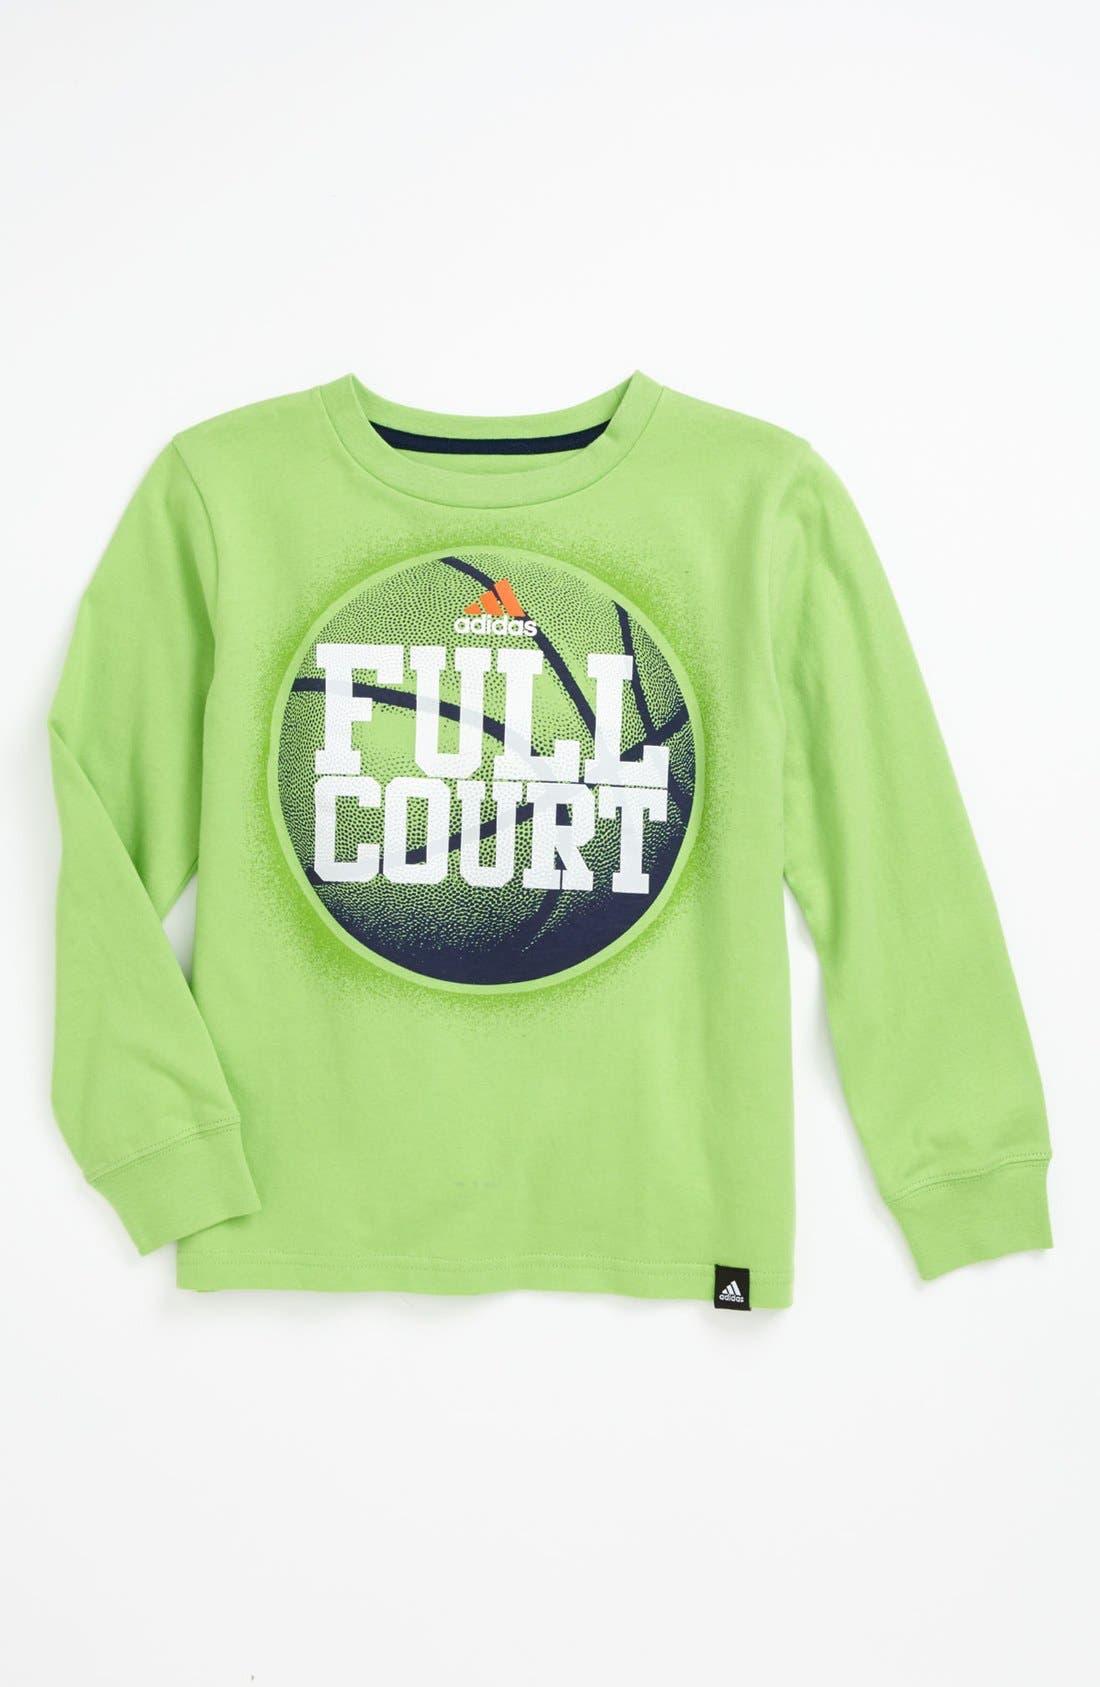 Main Image - adidas 'Full Court' Long Sleeve Tee (Little Boys)